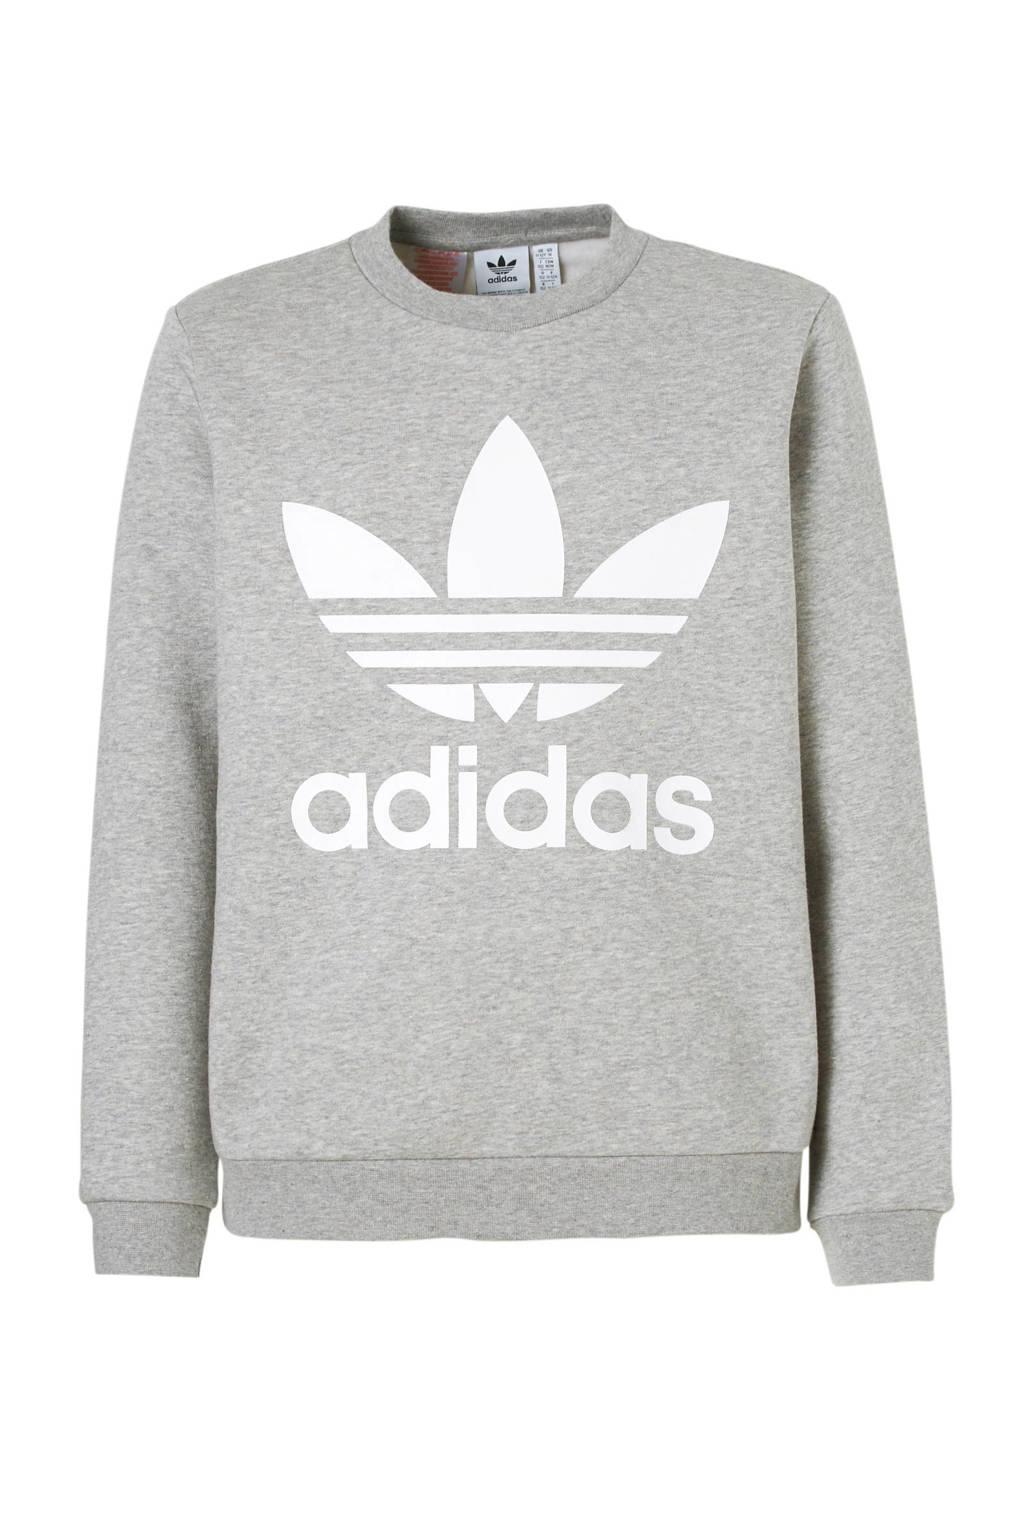 65707f6a307 adidas originals sweater, Grijs melange/wit